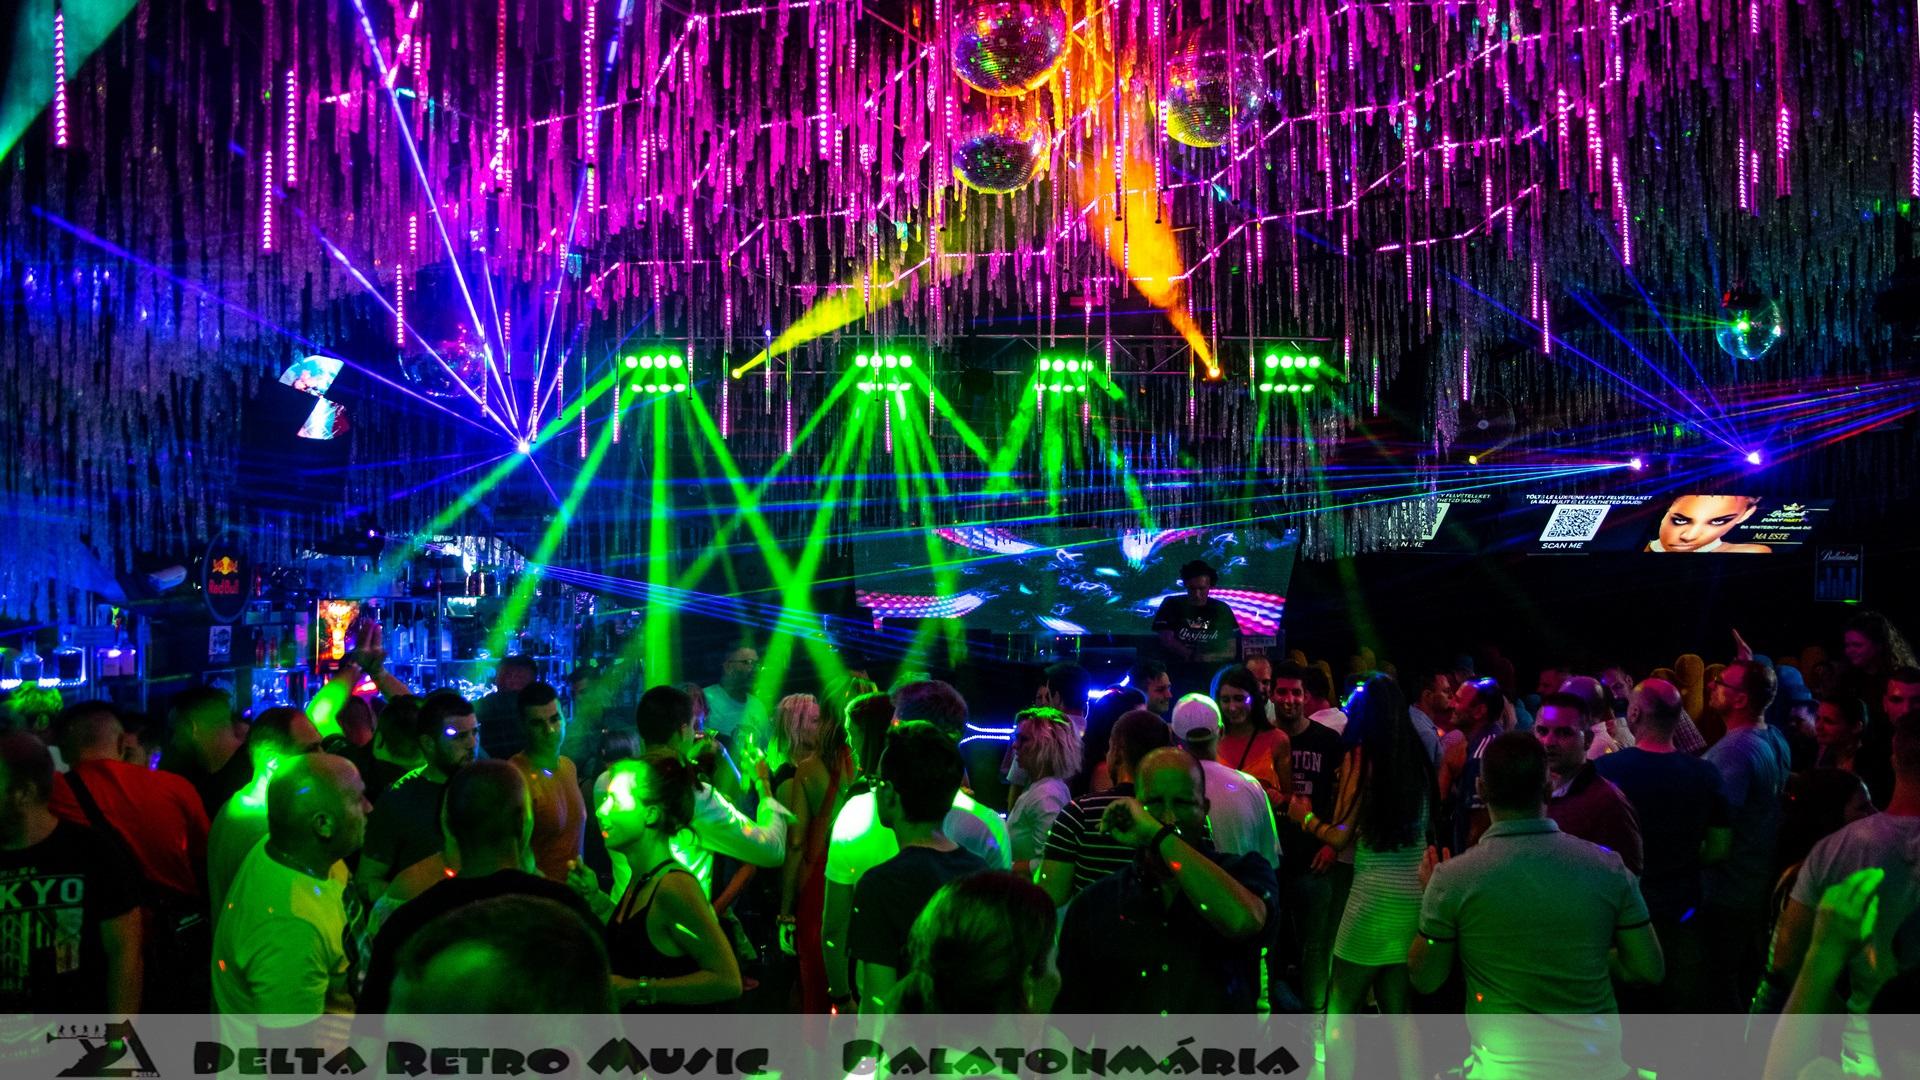 luxfunk-radio-funky-party_200807_delta retro-music-factory_024